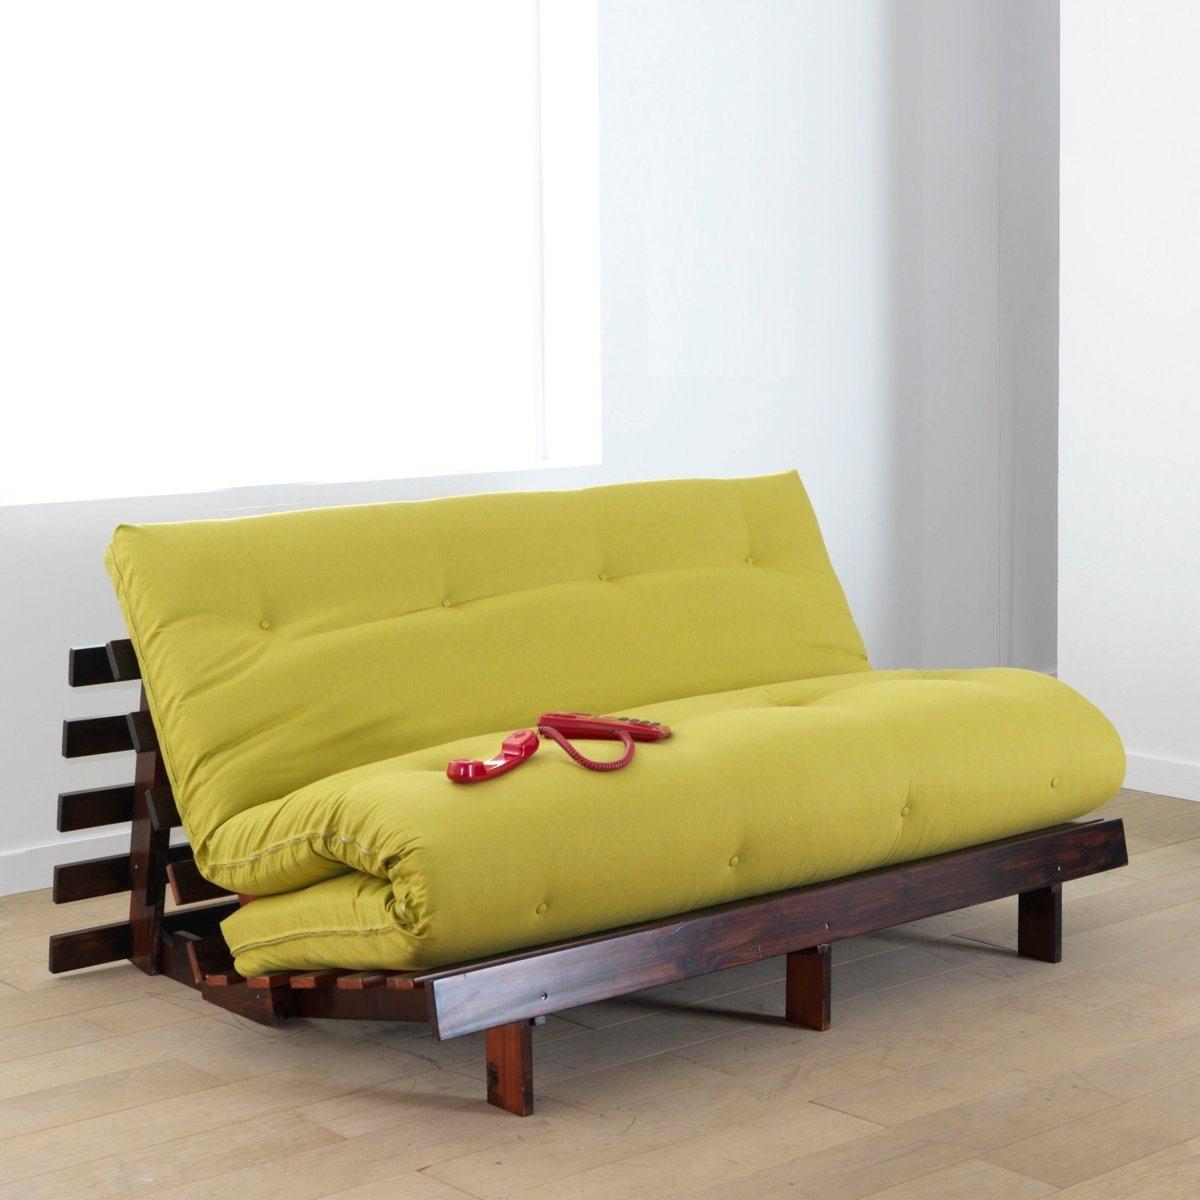 Colchón futón confort seda, cachemir, látex